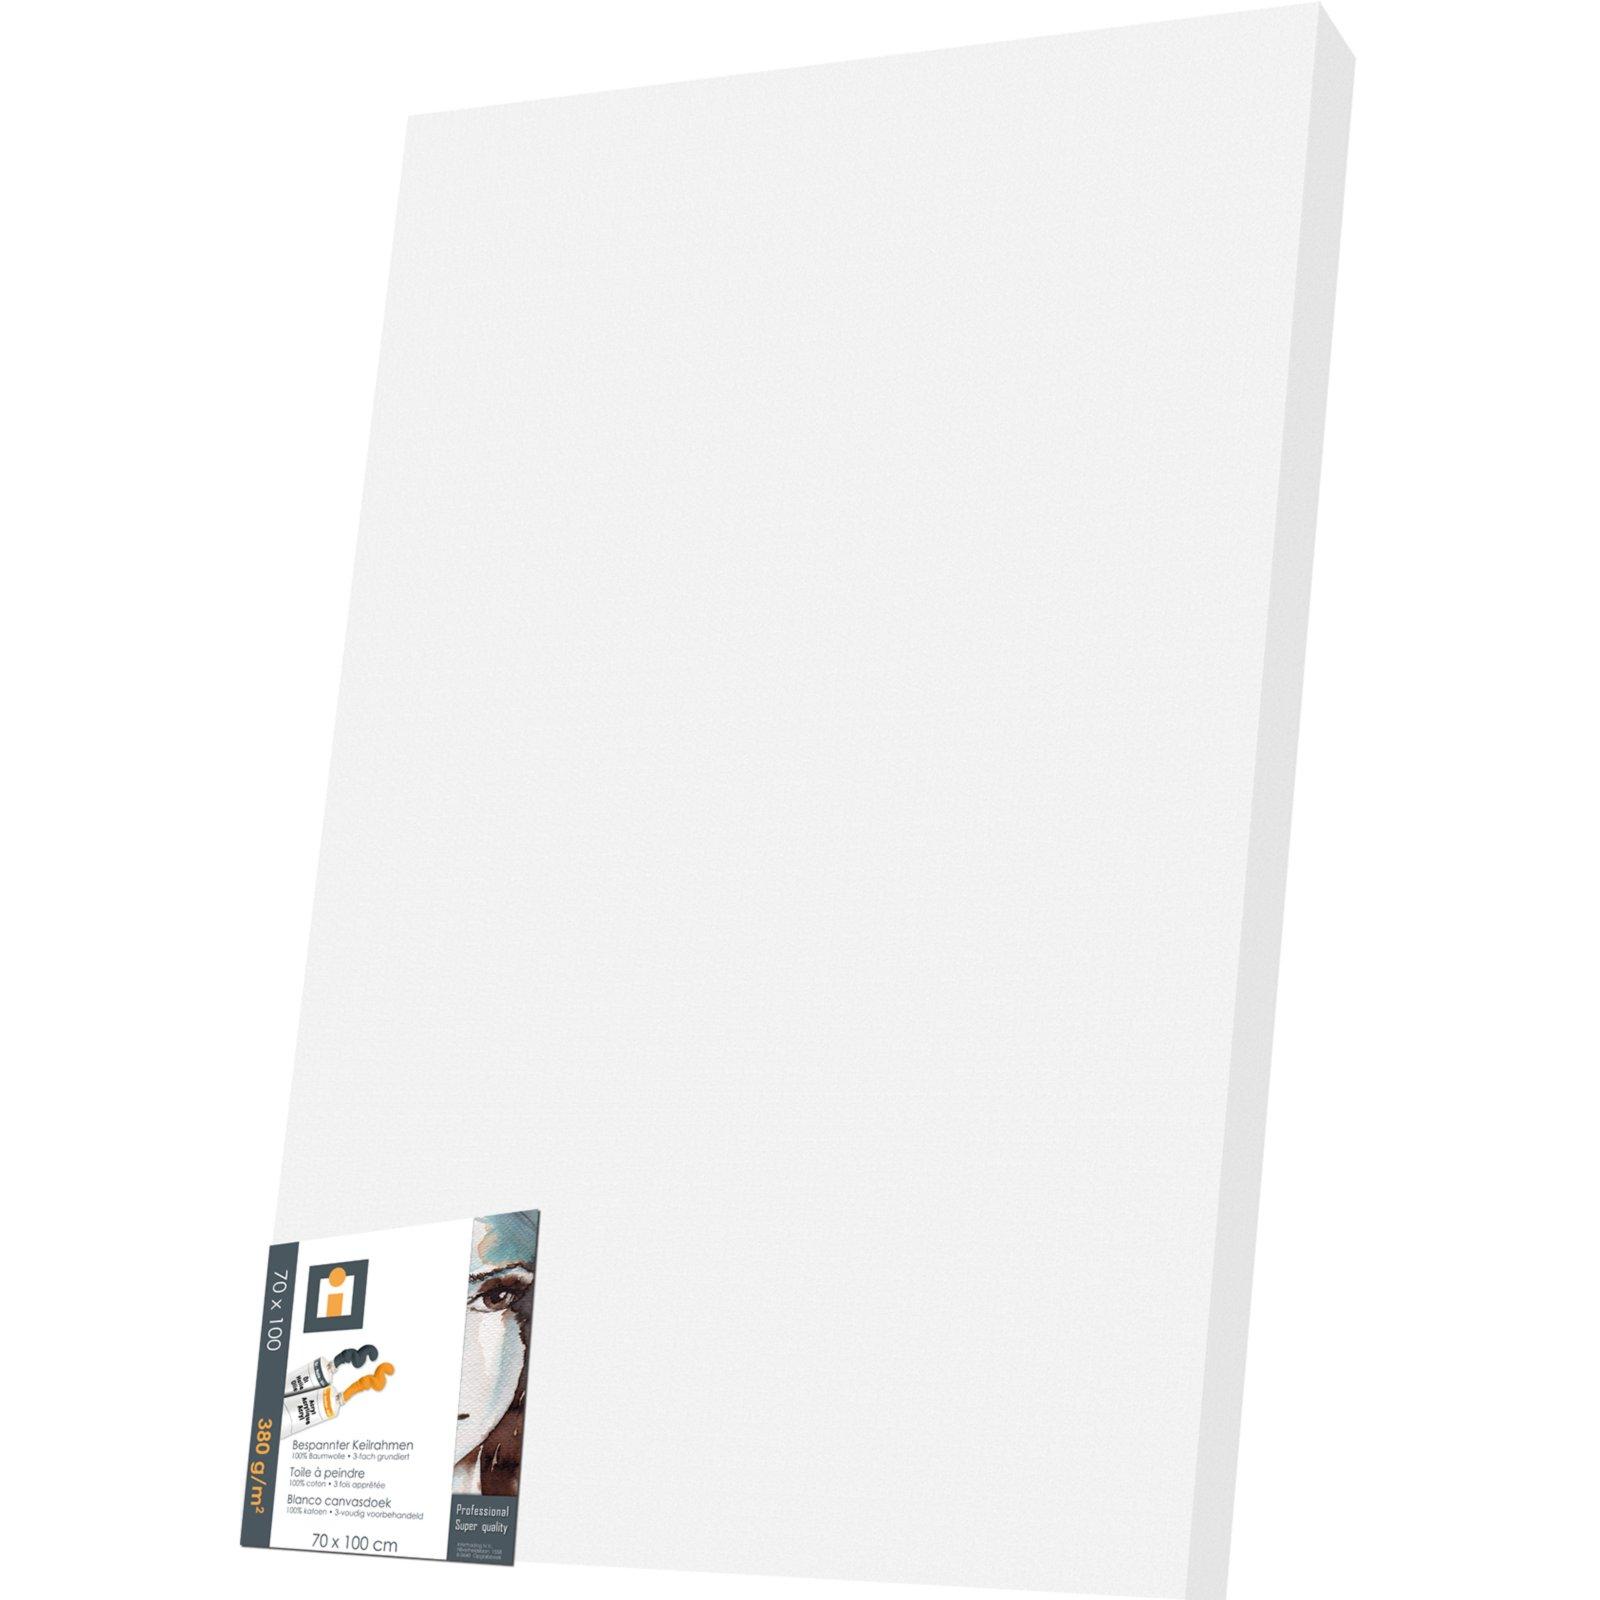 Künstler-Leinwand CANVAS - 70x100 cm   Leinwände   Nähen & Basteln ...